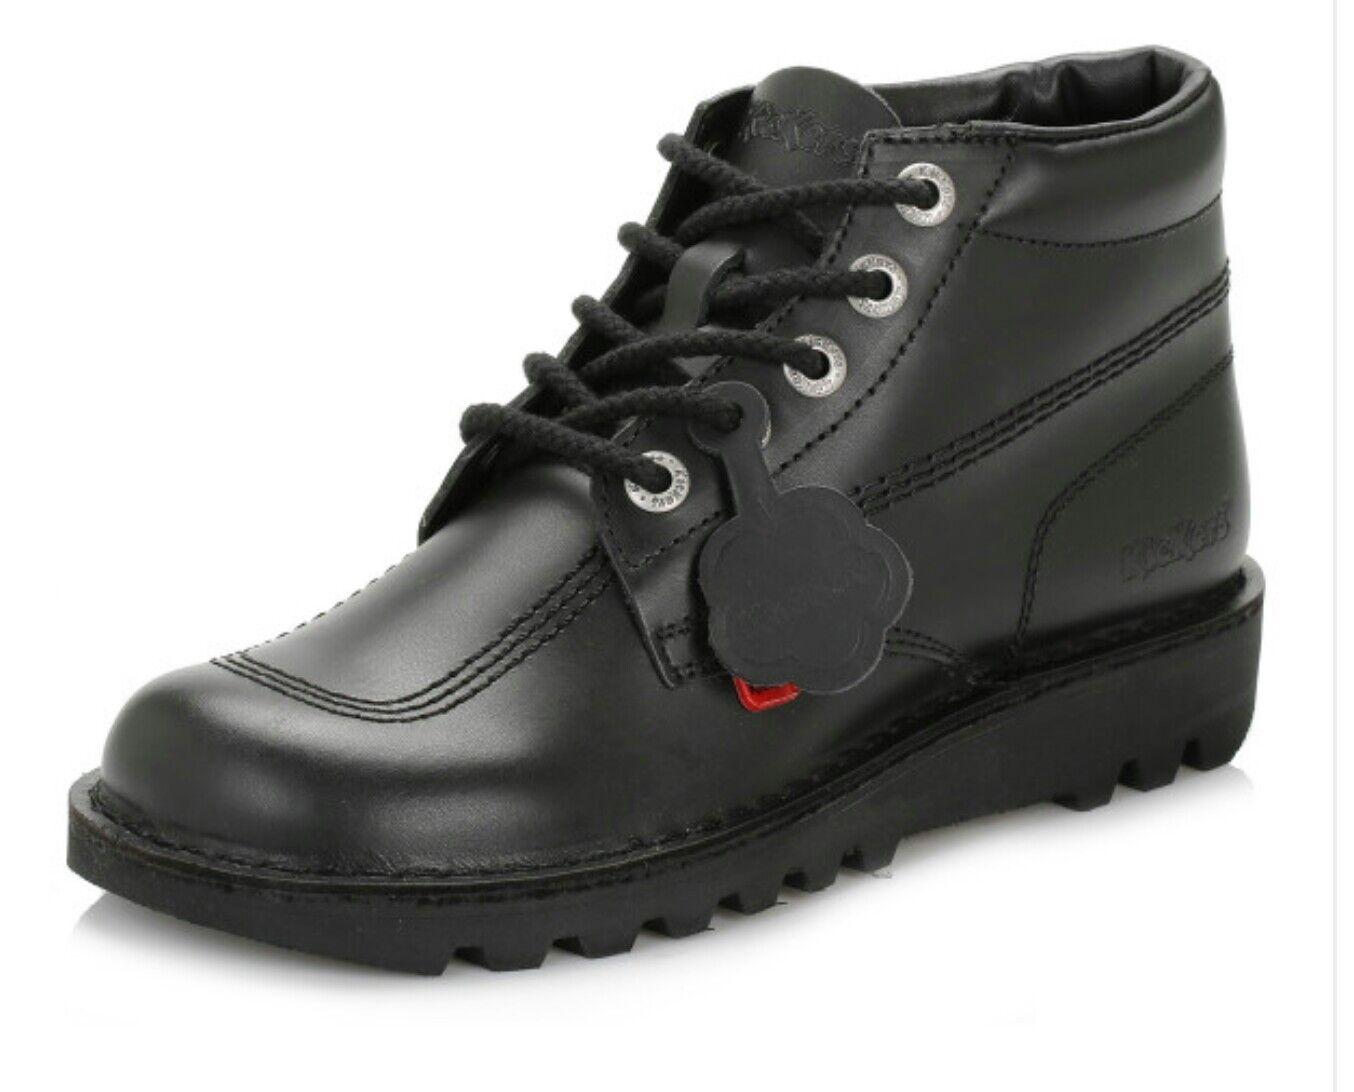 Kickers HI Junior/Youth Unisex Black Black Unisex Leather Ankle Boots UK Sizes 6 and 8 3d423c